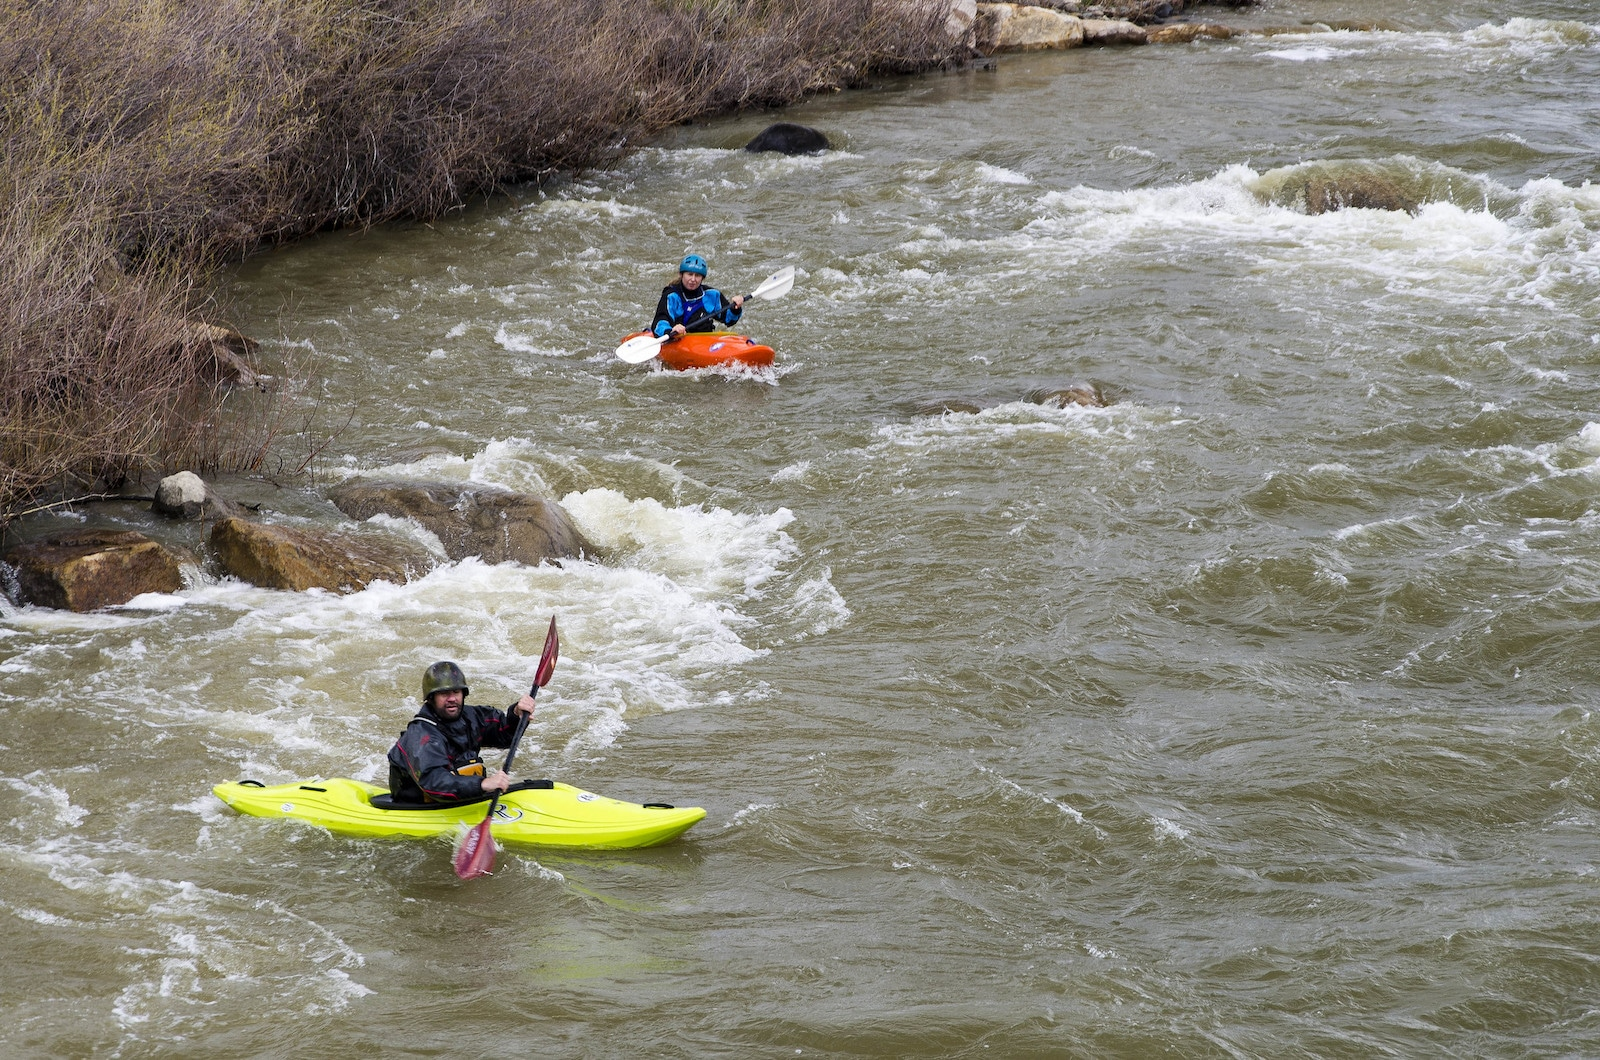 Image of kayakers in Pagosa Springs, Colorado